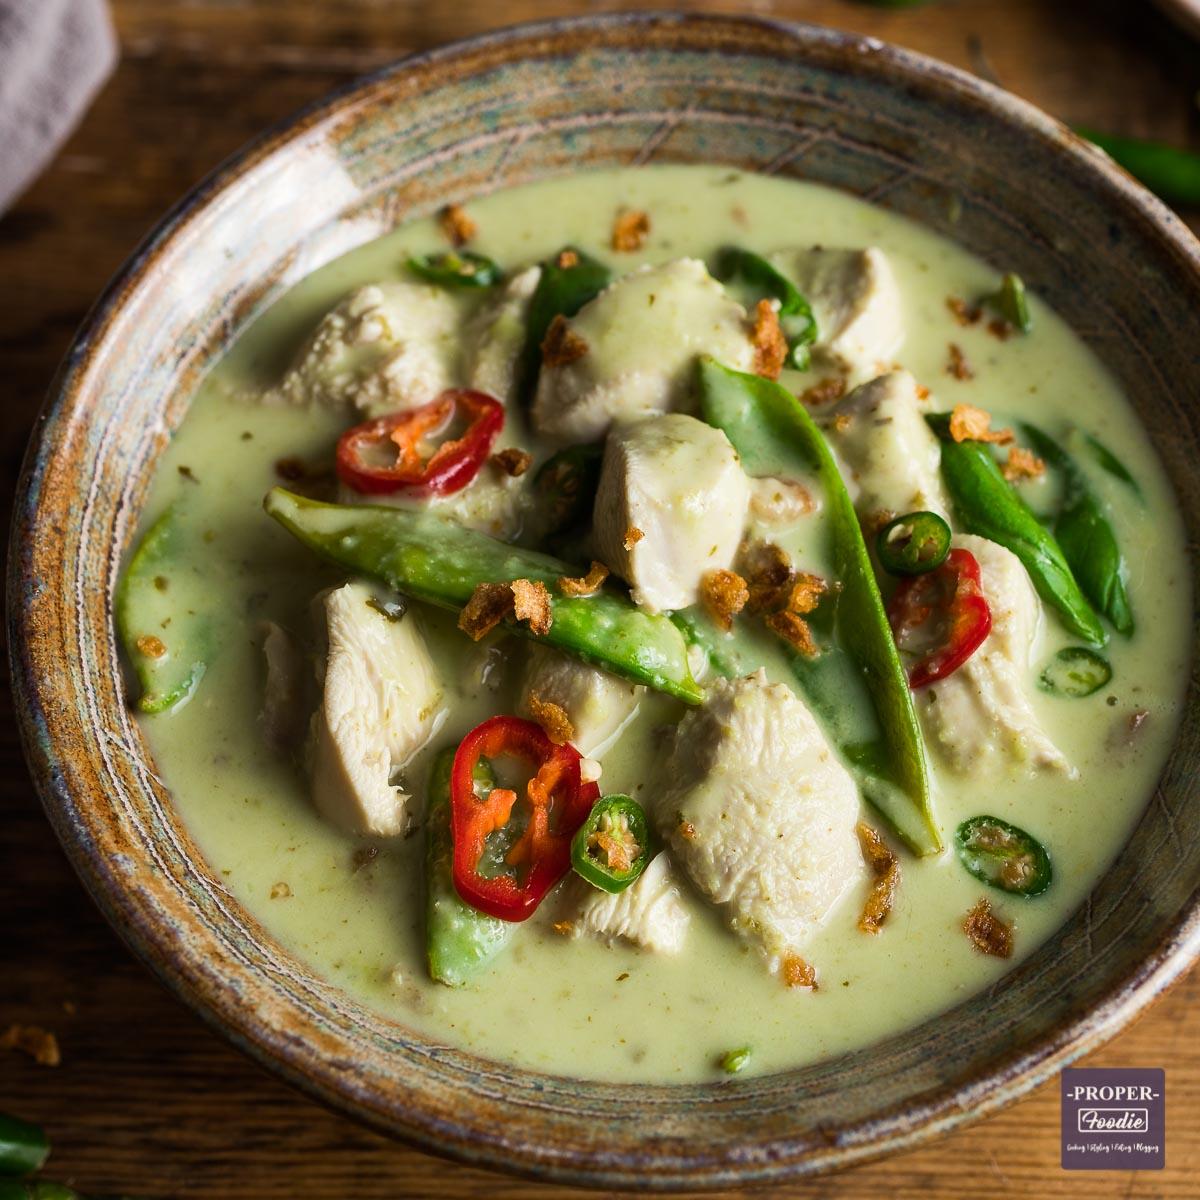 génial  Mot-Clé Thai Green Curry Recipe